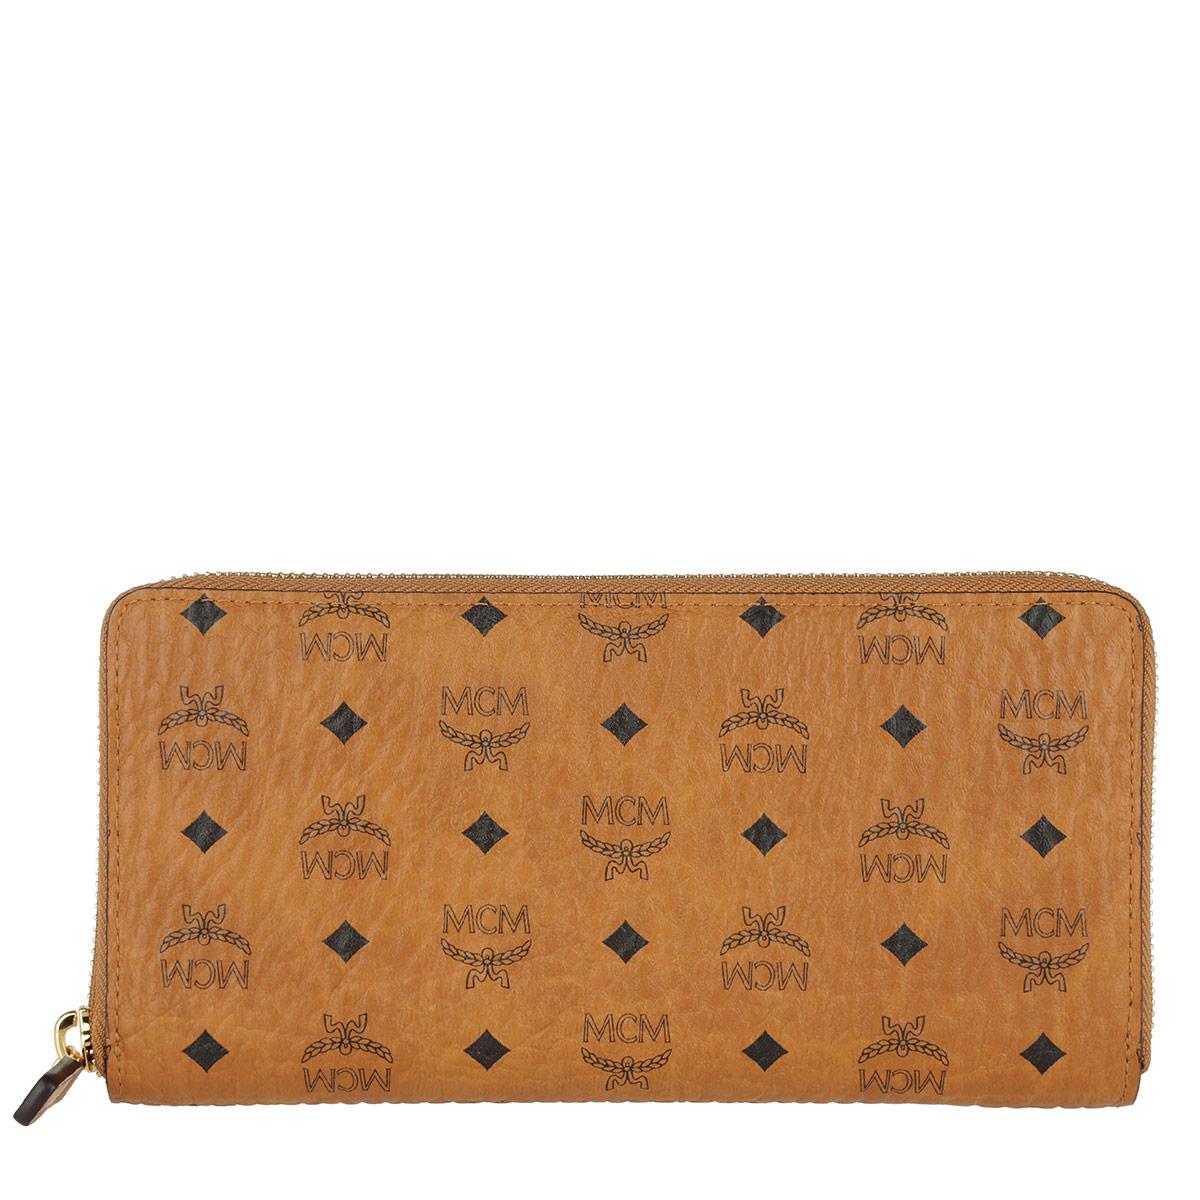 MCM Portemonnaie - Visetos Original Zipped Wallet Large Cognac - in cognac - für Damen